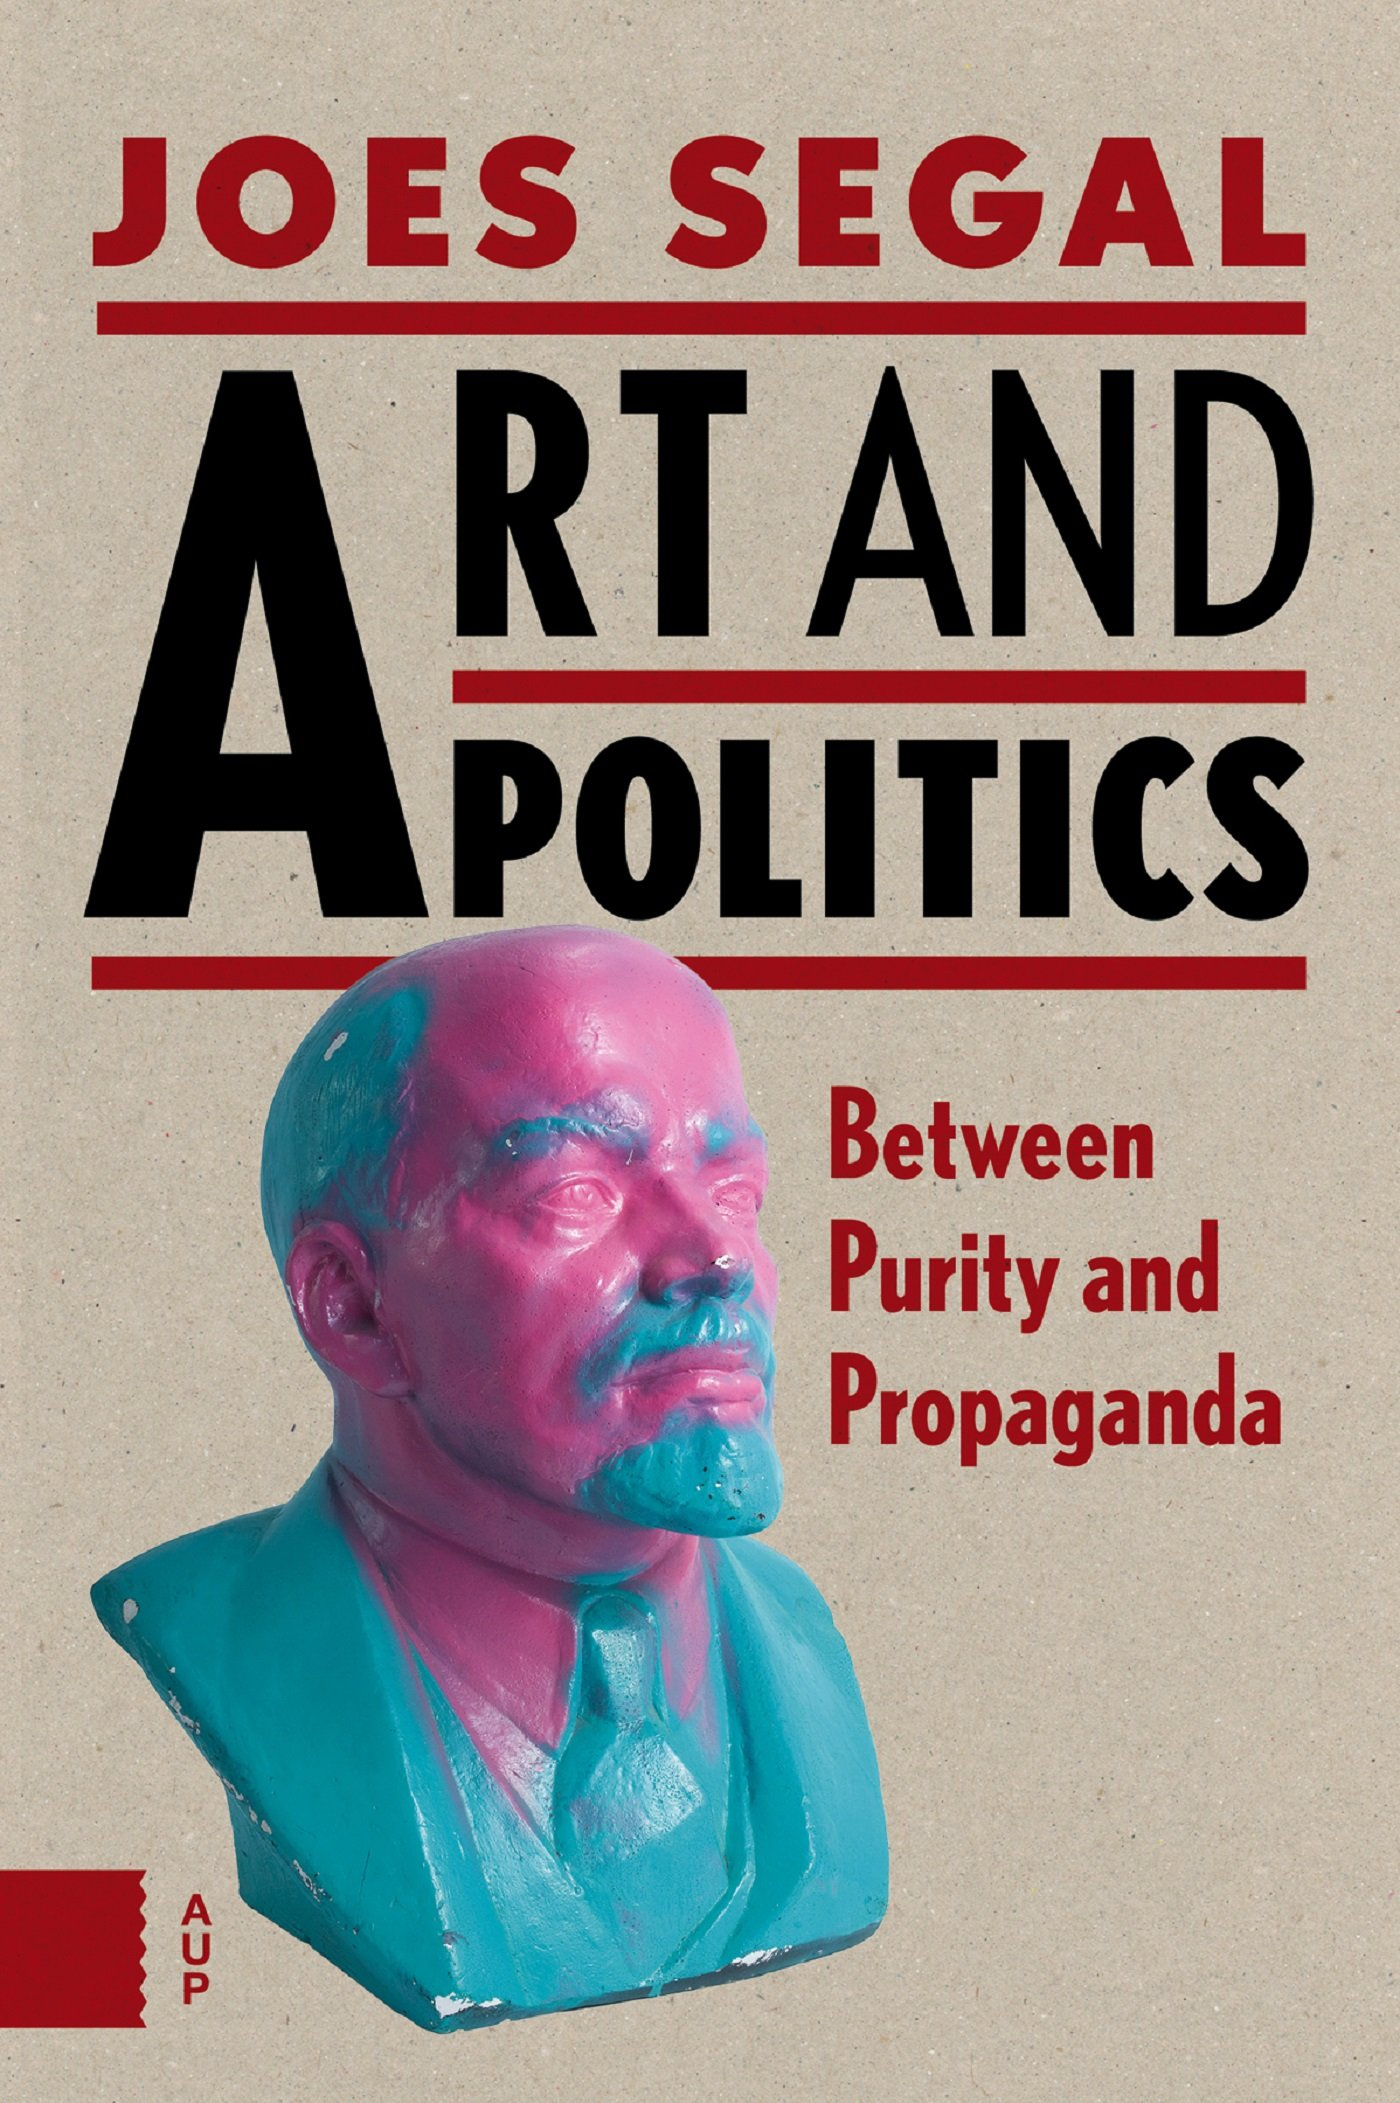 Art and Politics: Between Purity and Propaganda ebook